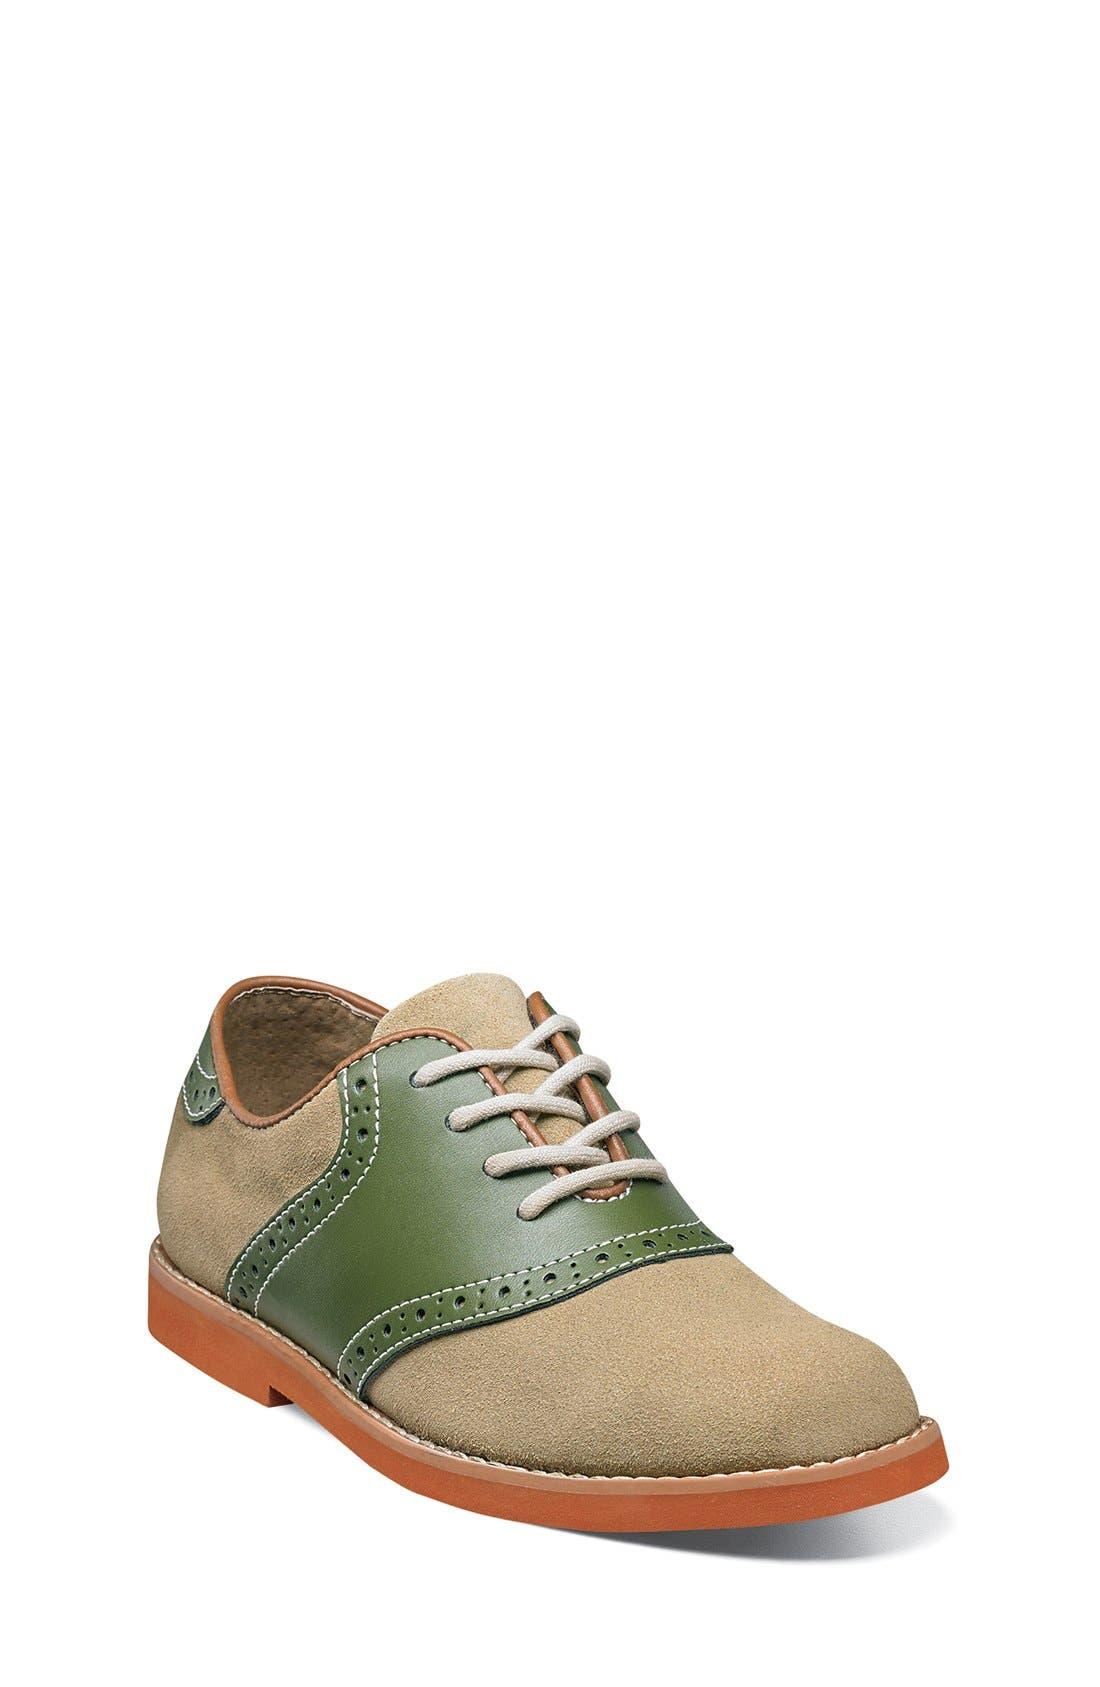 FLORSHEIM 'Kennett Jr.' Saddle Shoe